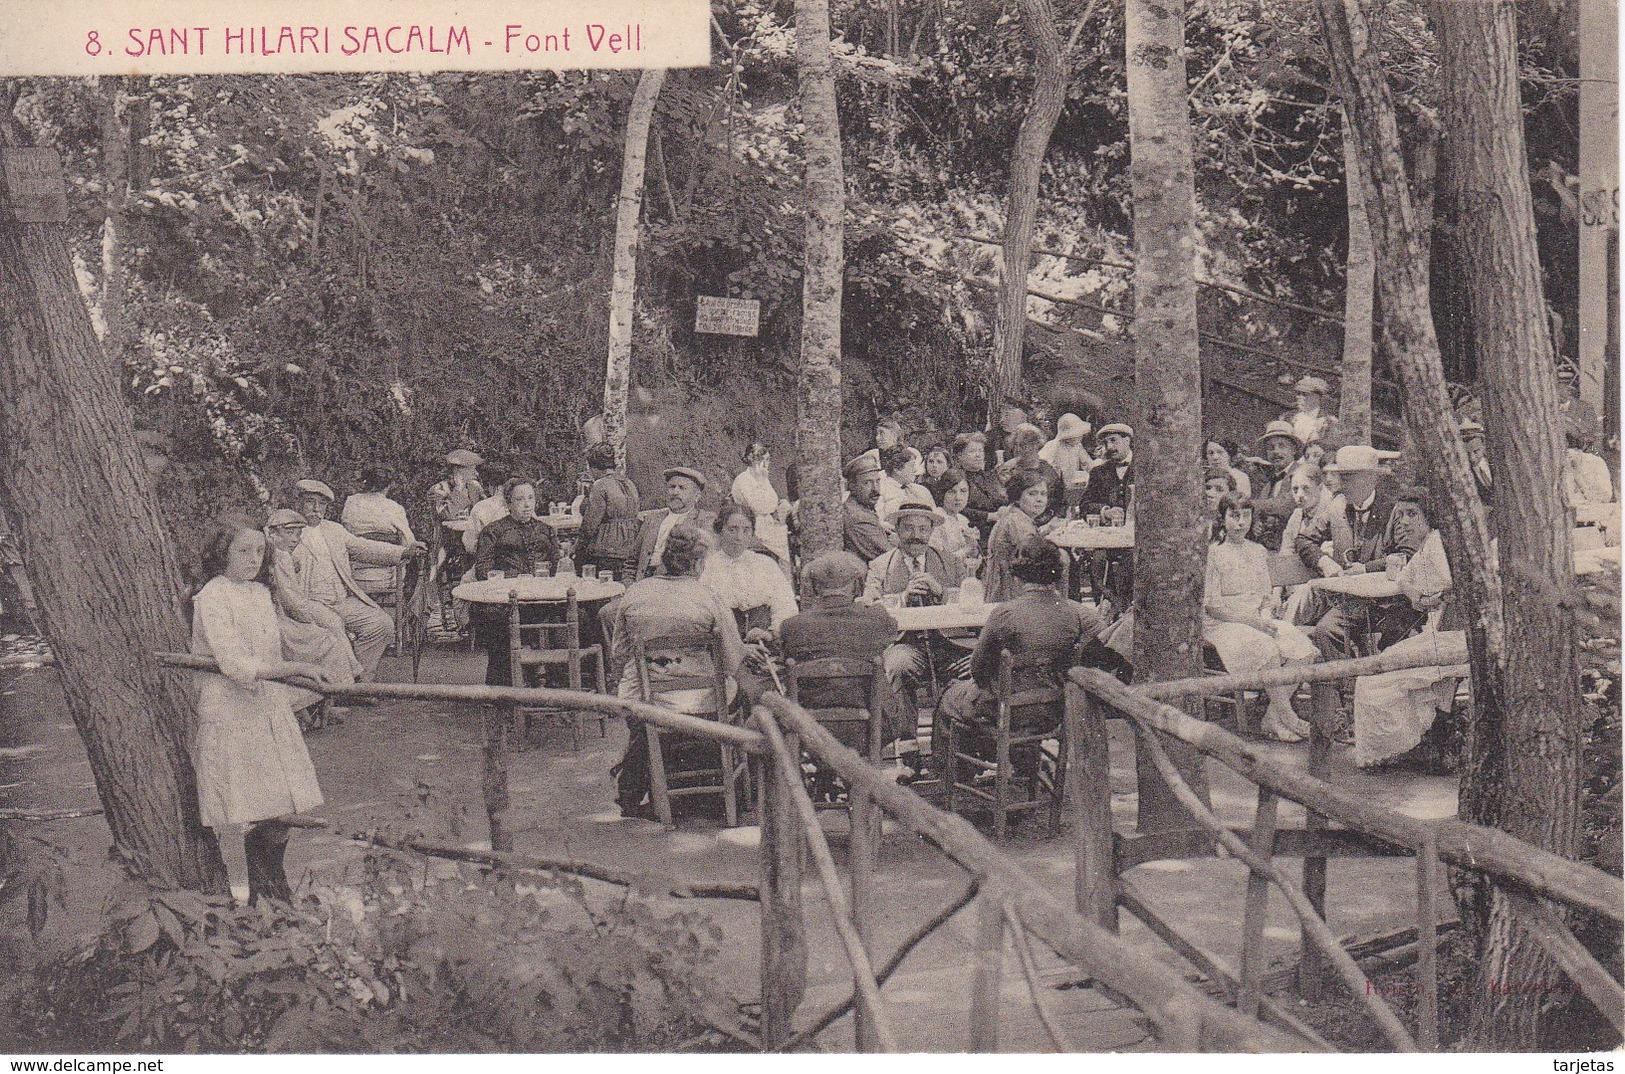 8 POSTAL DE SAN HILARI SACALM DE LA FONT VELL  (GIRONA-GERONA) - Gerona